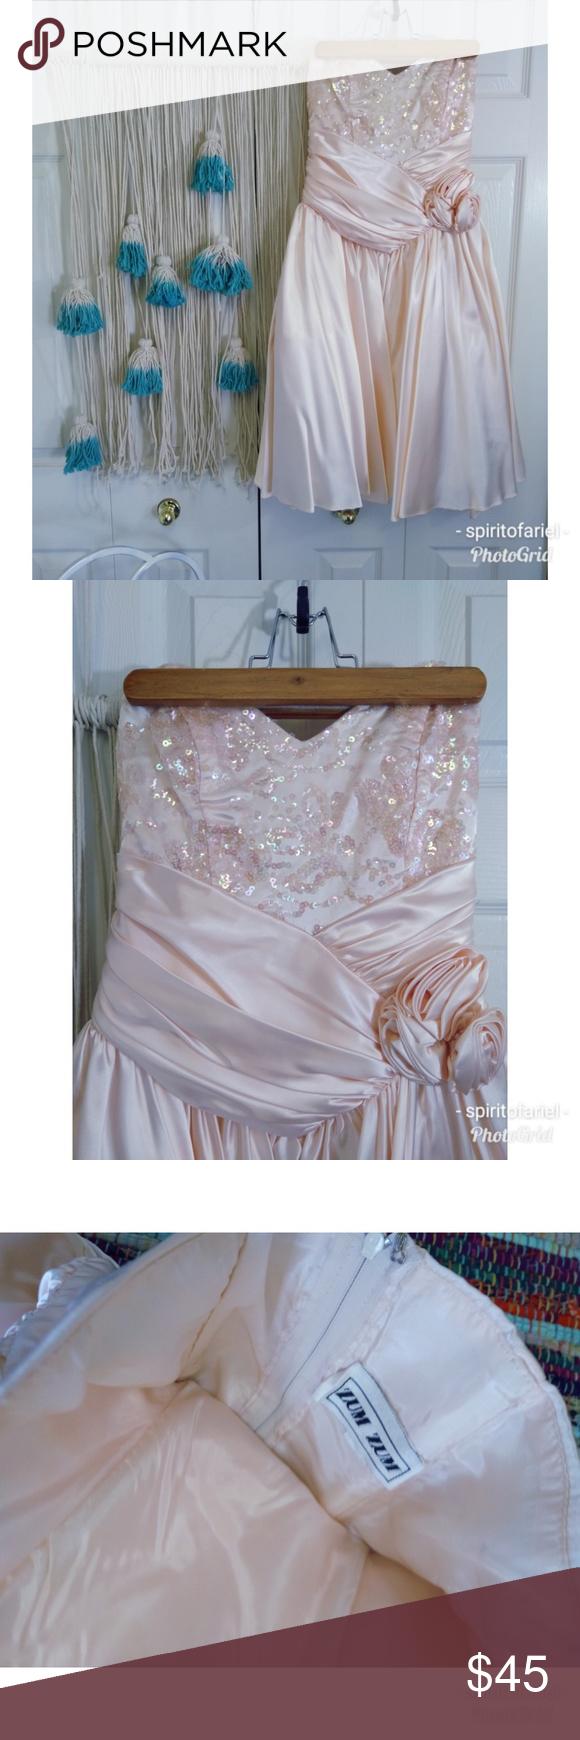 Adorable s peach sequin prom dress sequin prom dresses full